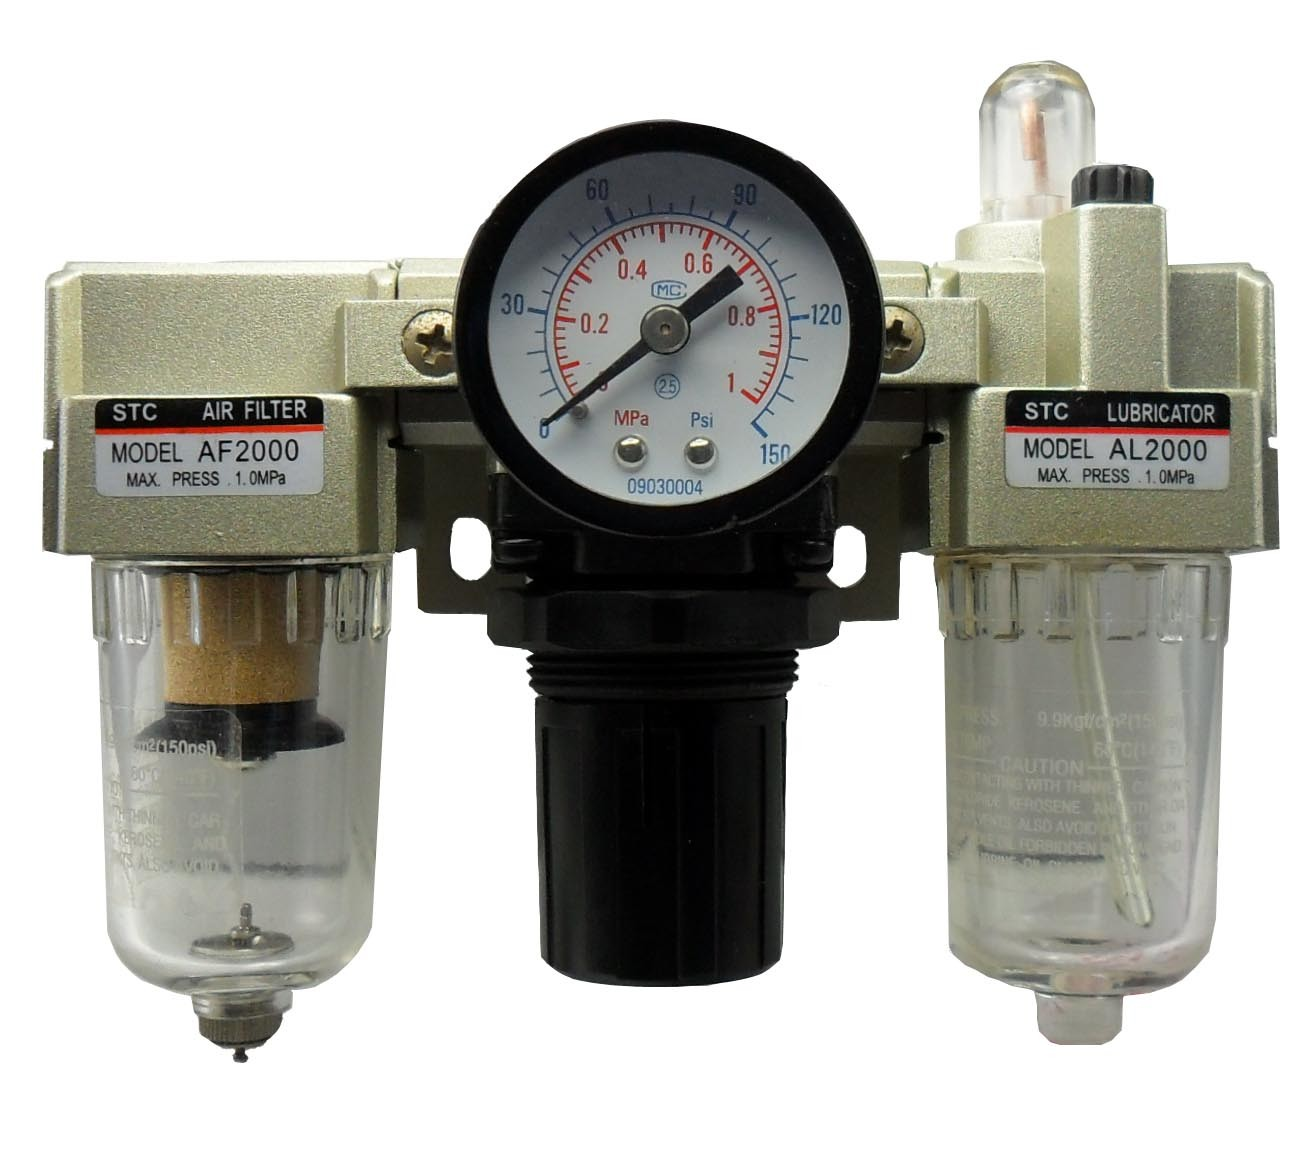 China STC Air Filter Regulator Lubricator (AC1000-500 Series) - China ...